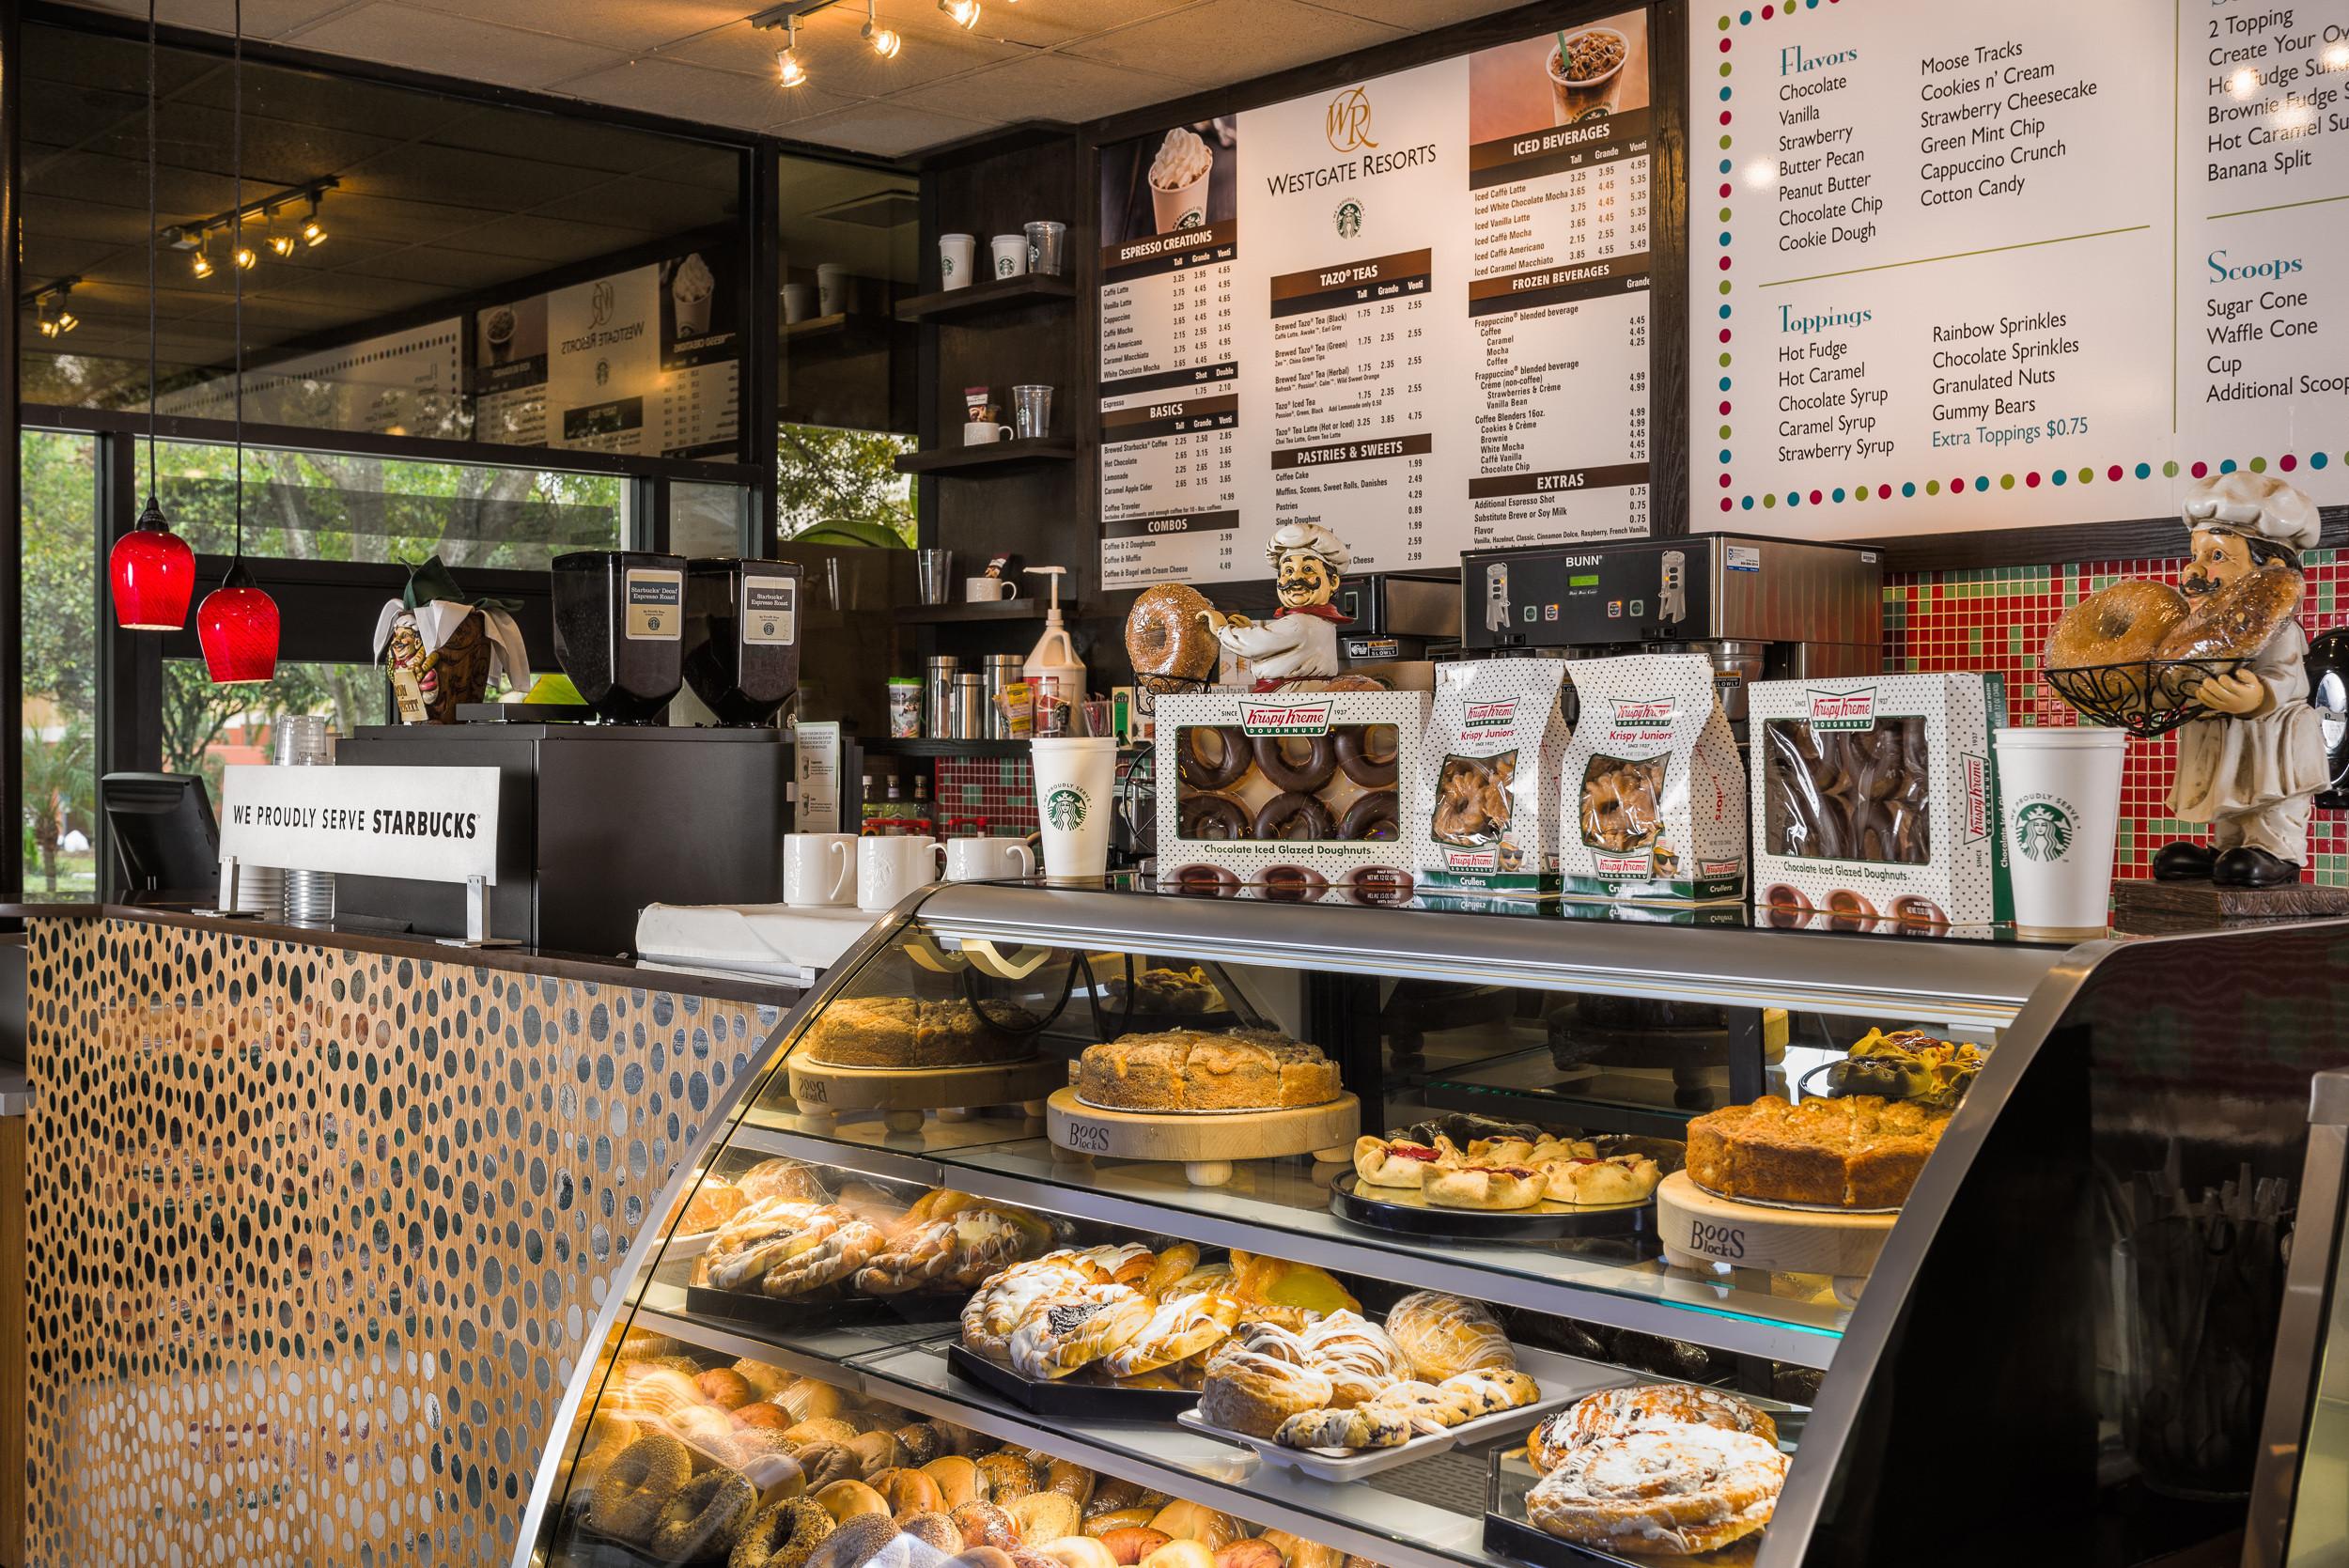 Hershey's Ice Cream Shop Kissimmee | Westgate Vacation Villas Resort & Spa